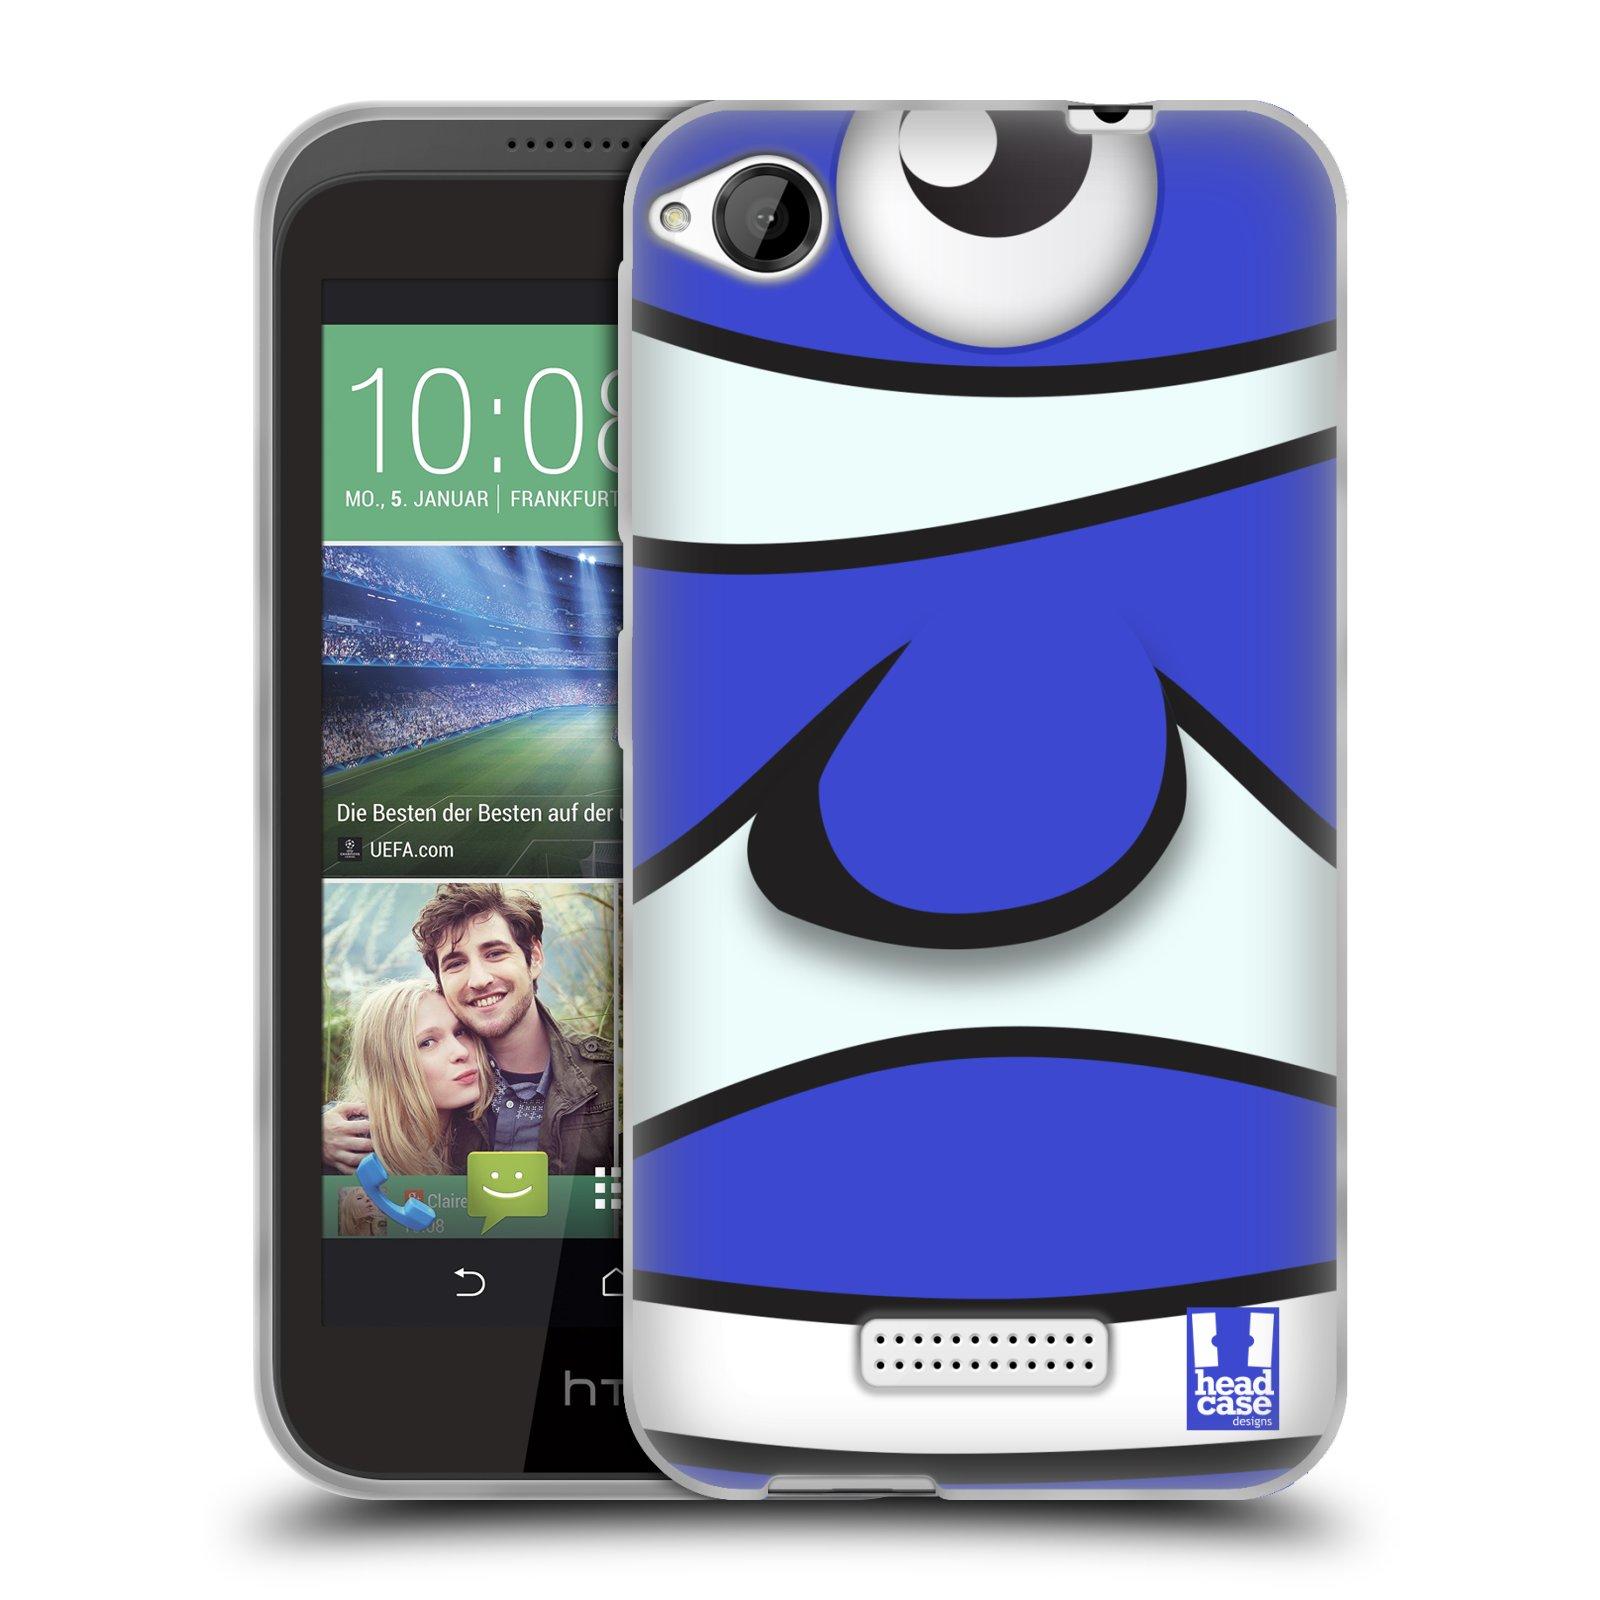 HEAD CASE silikonový obal na mobil HTC DESIRE 320 vzor Rybičky z profilu modrý klaun